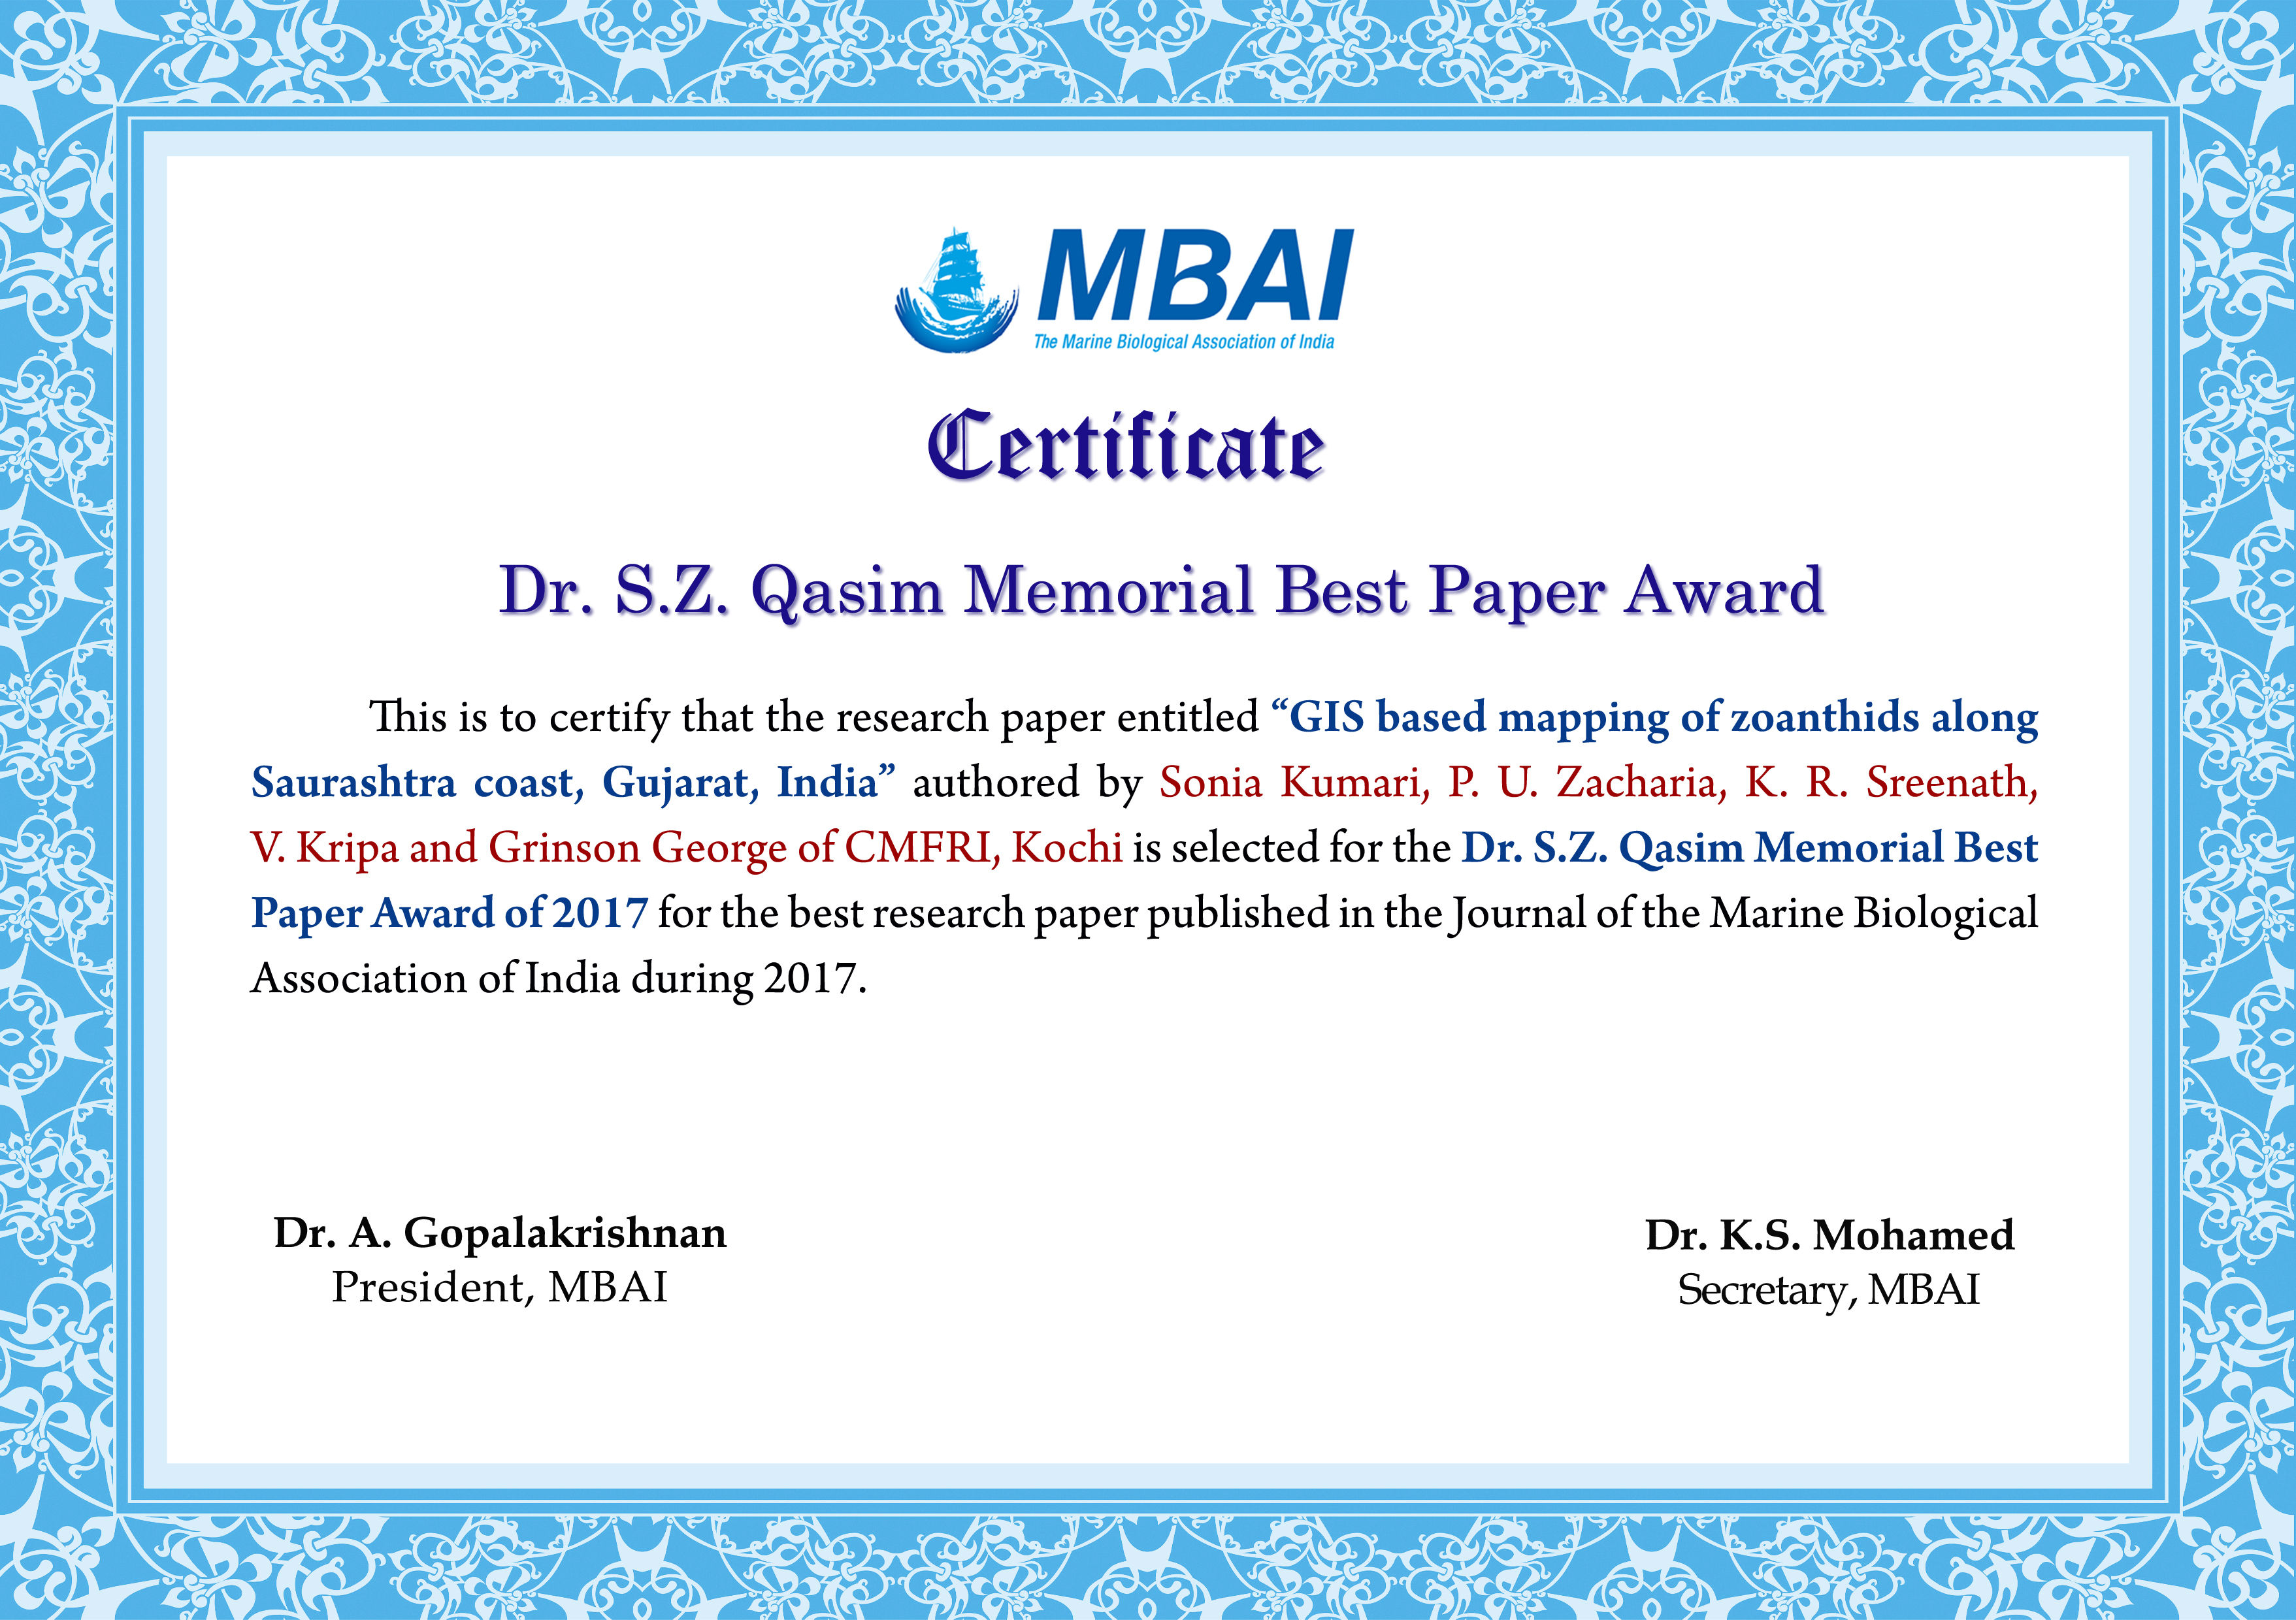 mbai the marine biological association of india